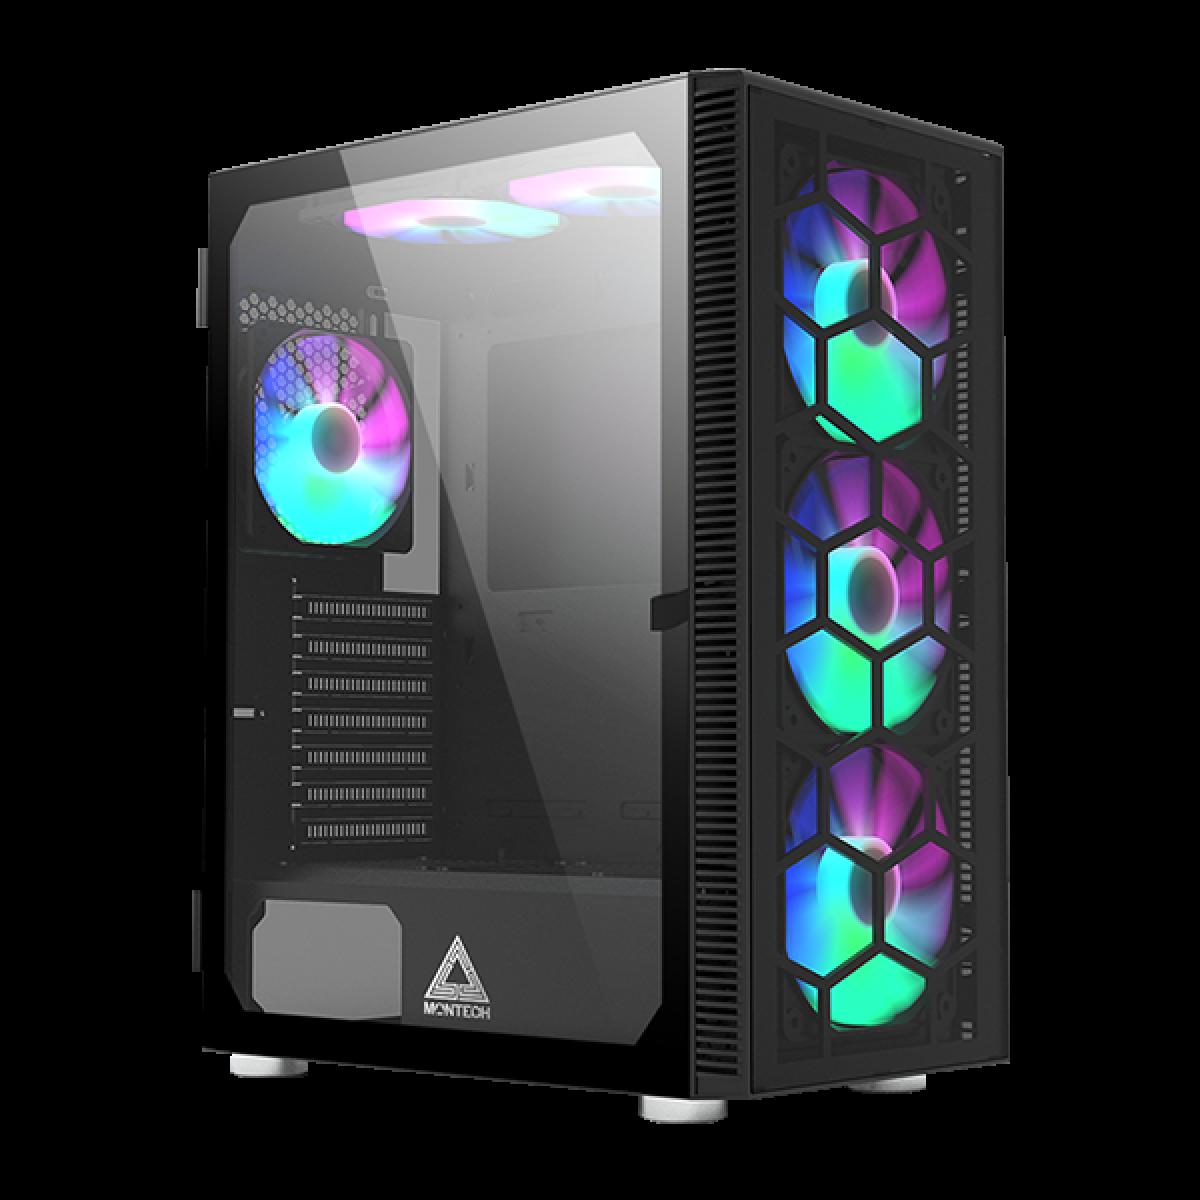 Gabinete Gamer Montech x3 Glass, Mid Tower, Black, ATX, Com 6 Fans RGB, Vidro Temperado